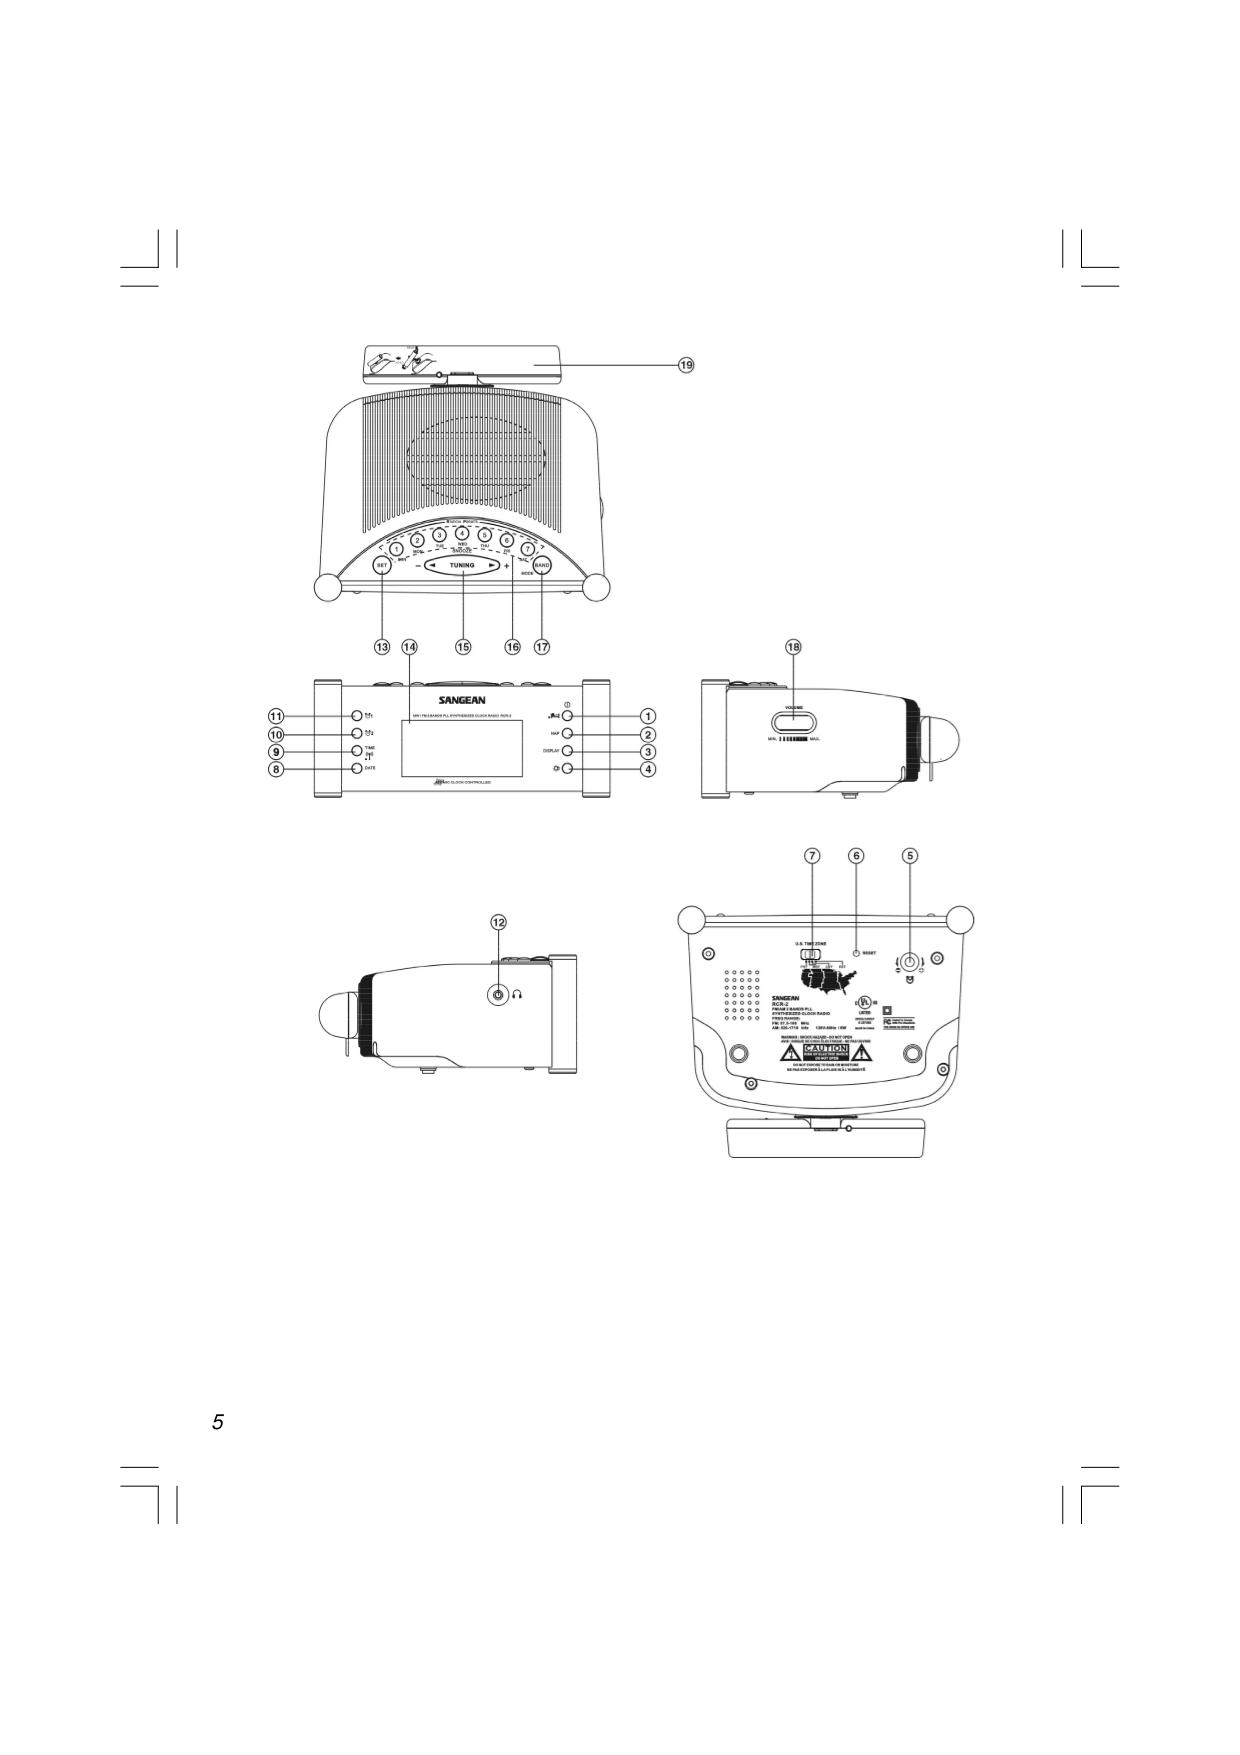 PDF manual for Sangean Clock Radio RCR-2